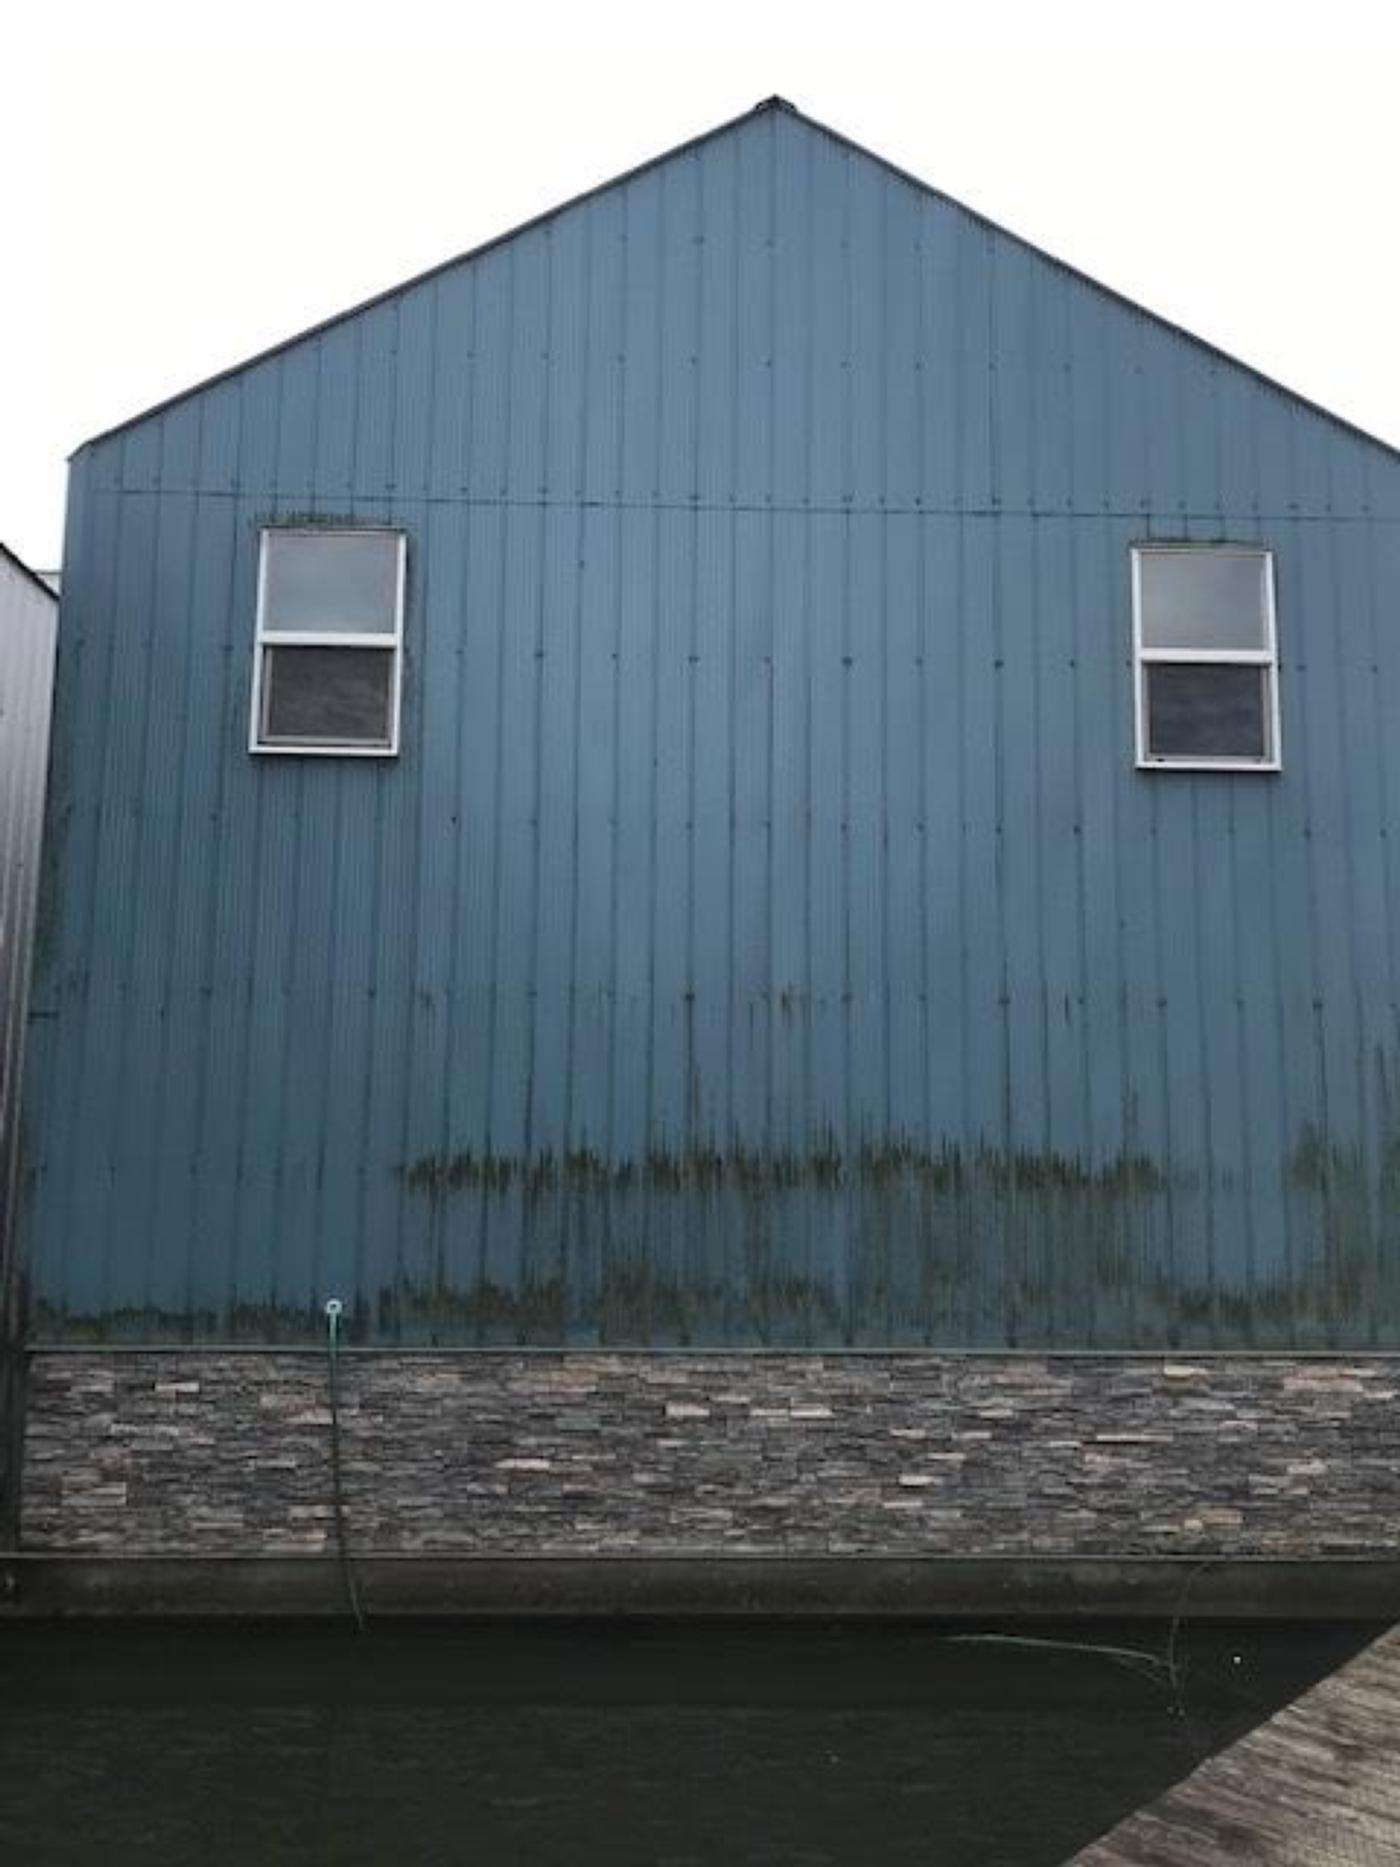 2008 Custom 60 Boathouse, Stone face veneer facing